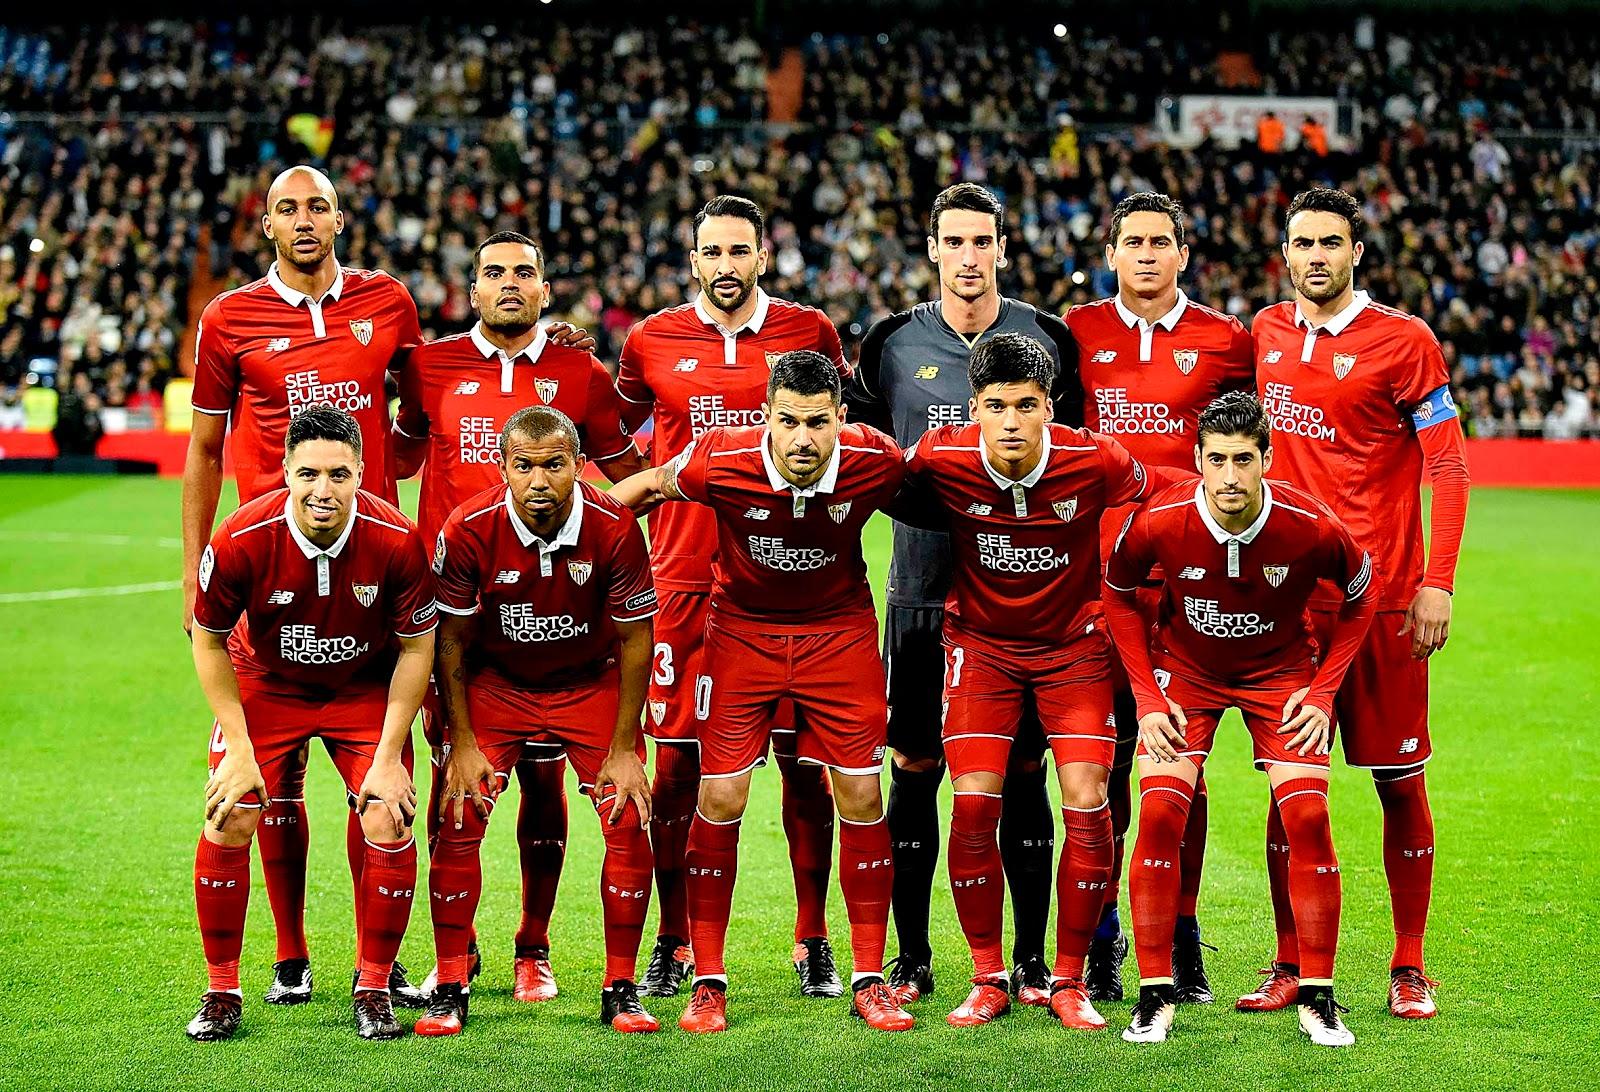 Hilo del Sevilla FC Sevilla%2B2017%2B01%2B04